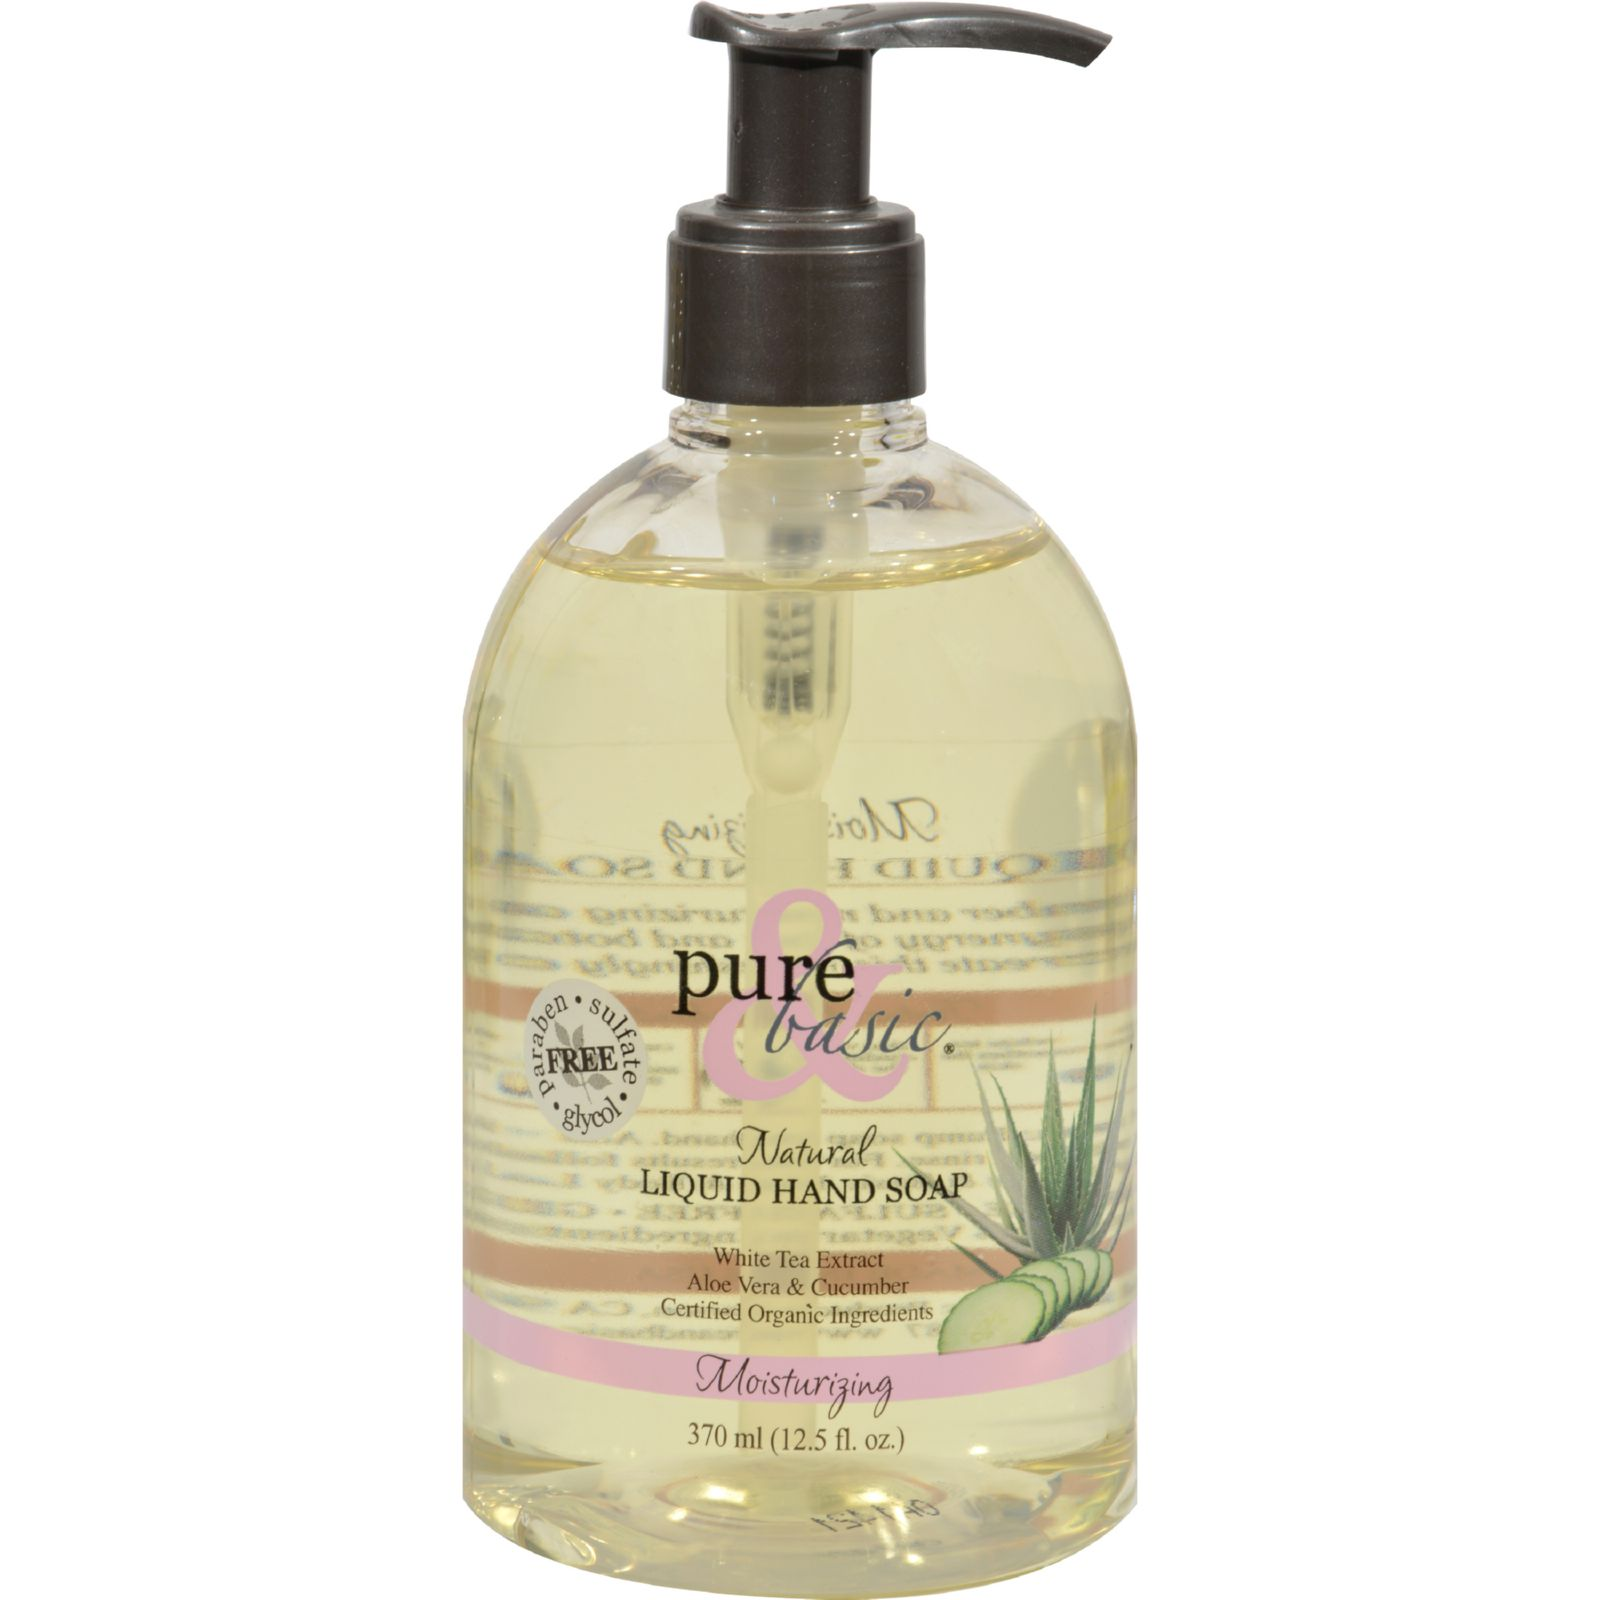 Pure And Basic Moisturizing Green Tea Naturals Liquid Hand Soap - 12.5 Fl Oz